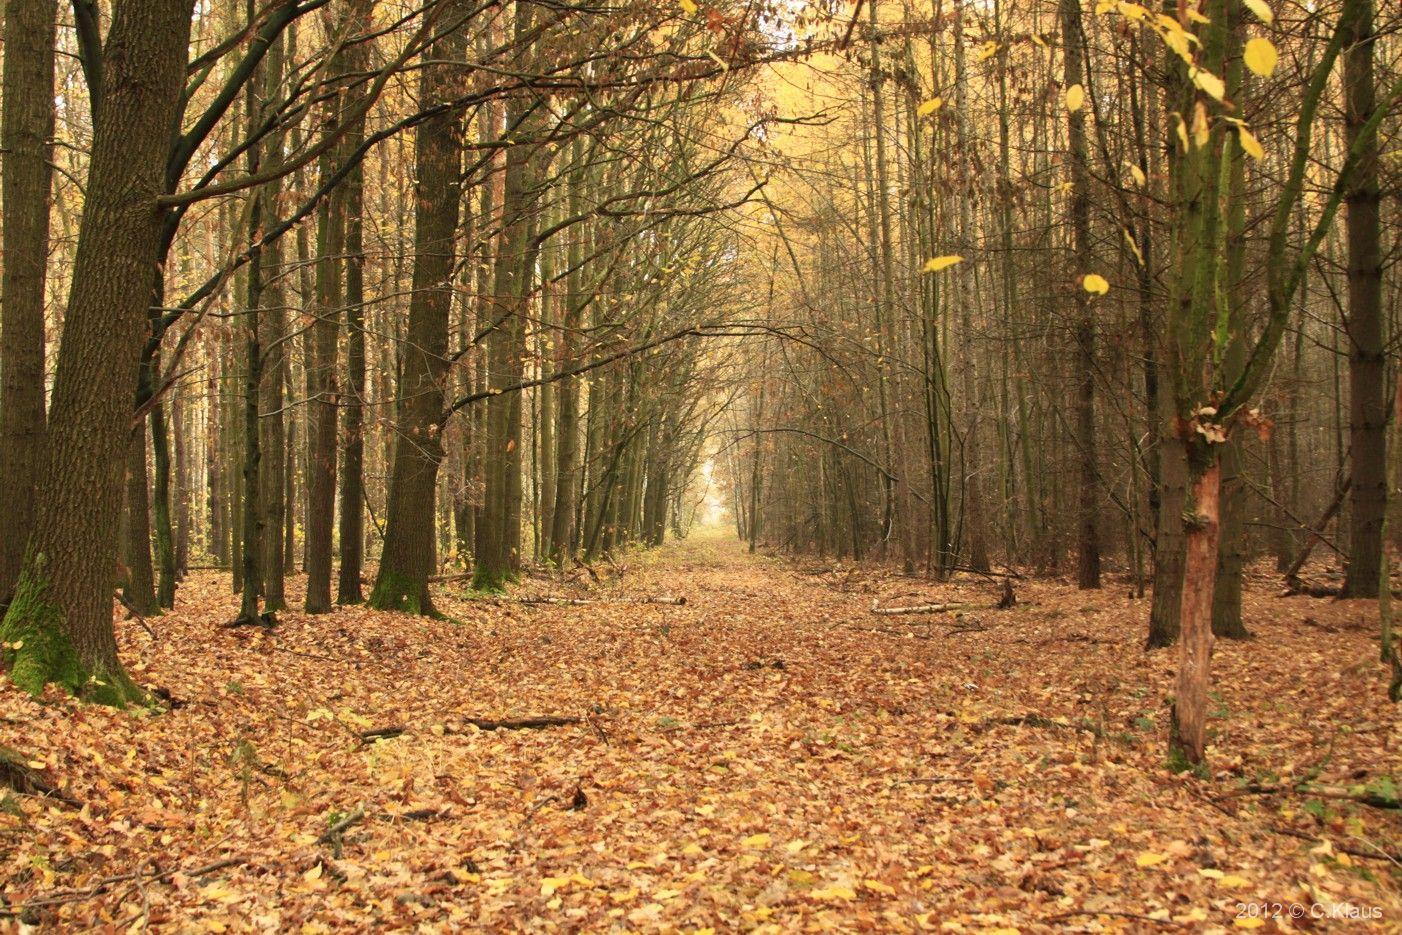 Meine Gedichte: Spu00e4therbst - November im Wald